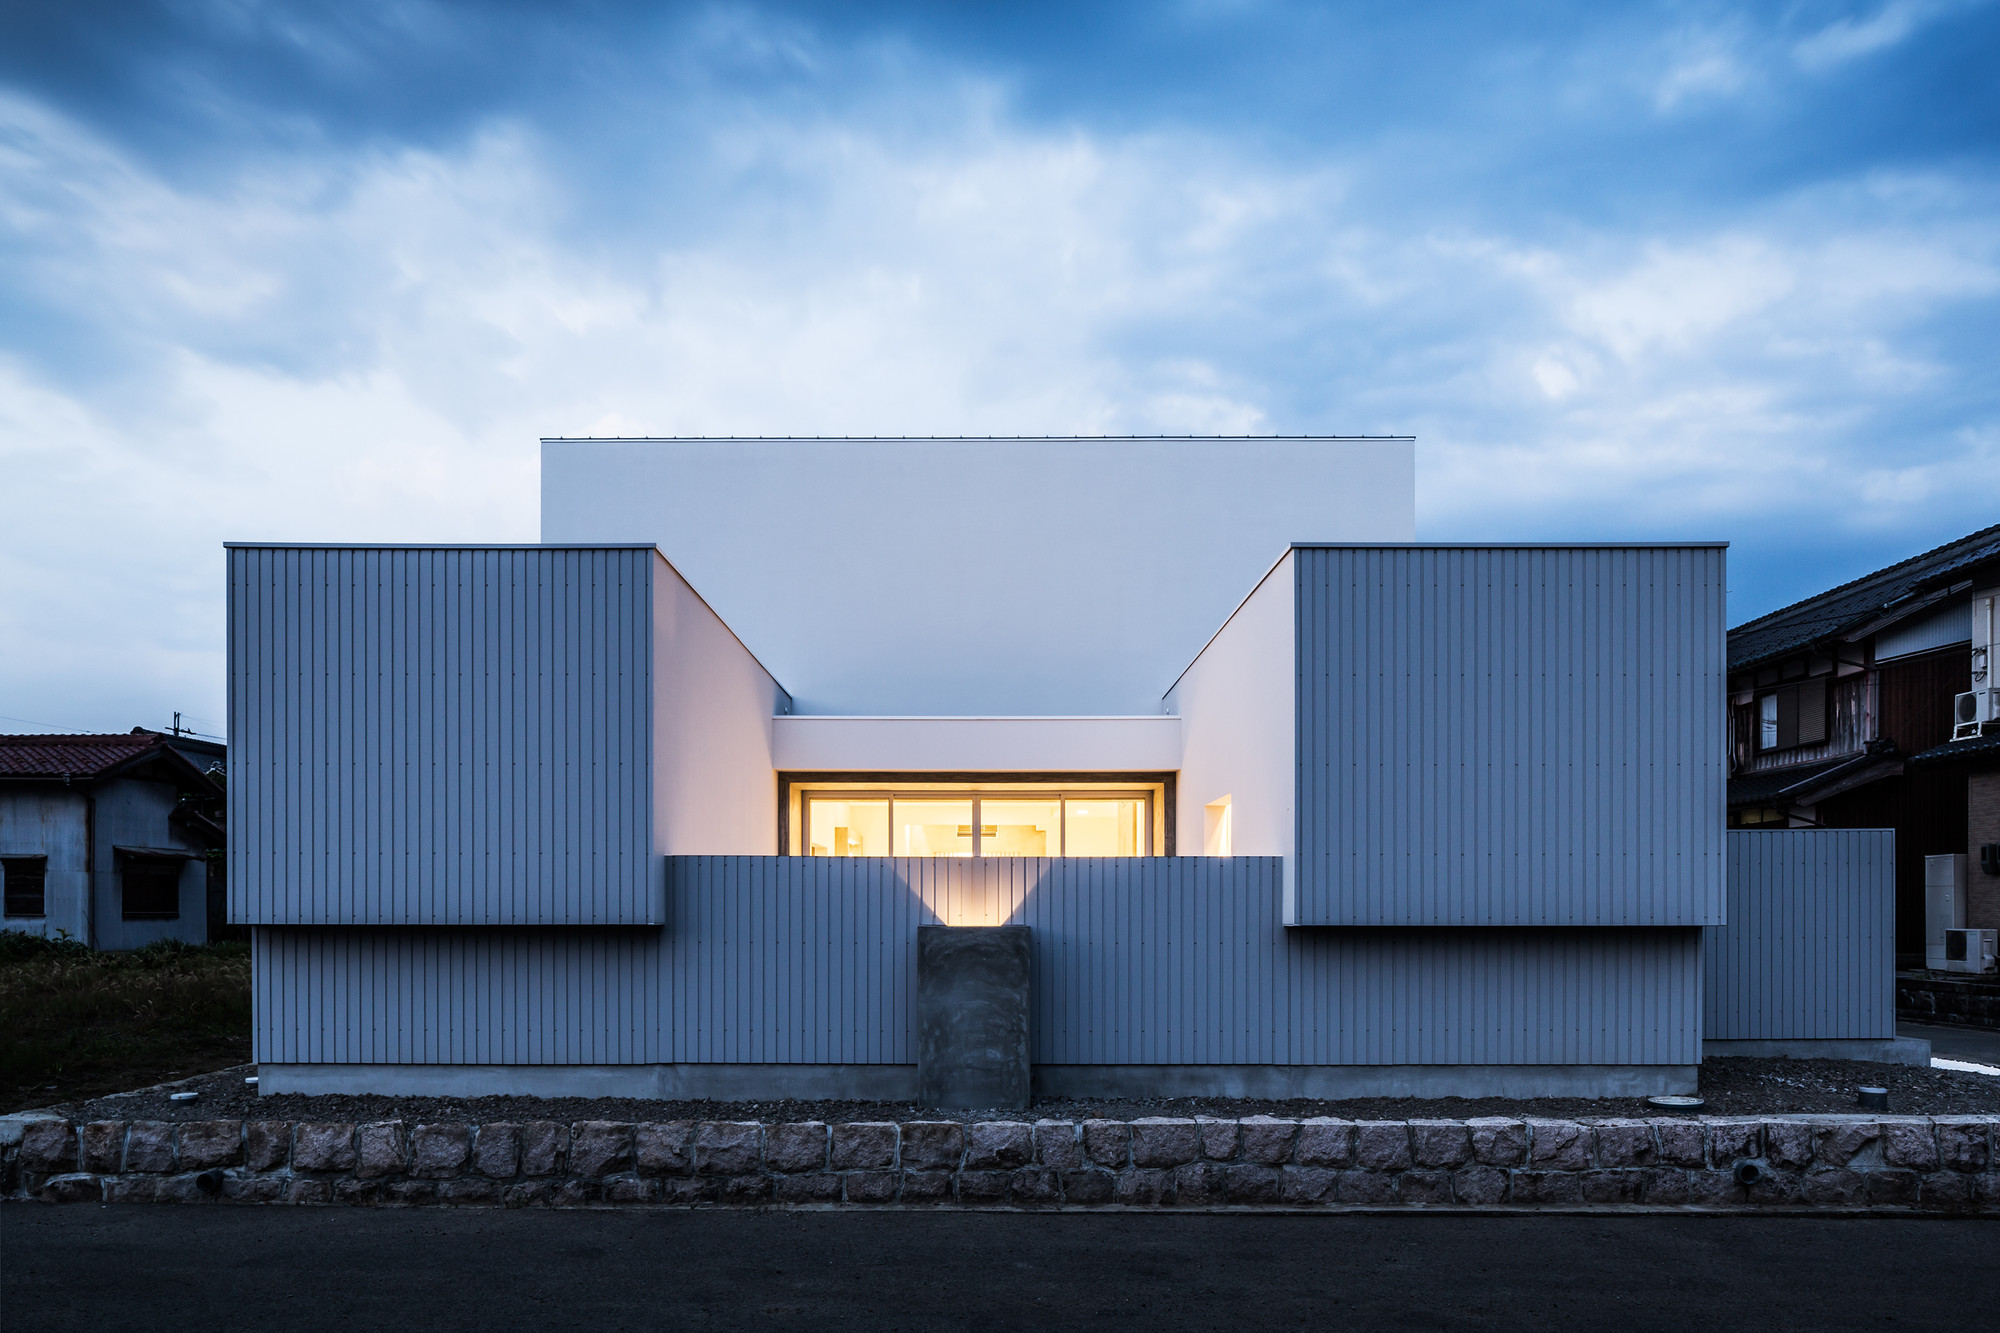 Courtyard House / FORM | Kouichi Kimura Architects, © Yoshihiro Asada